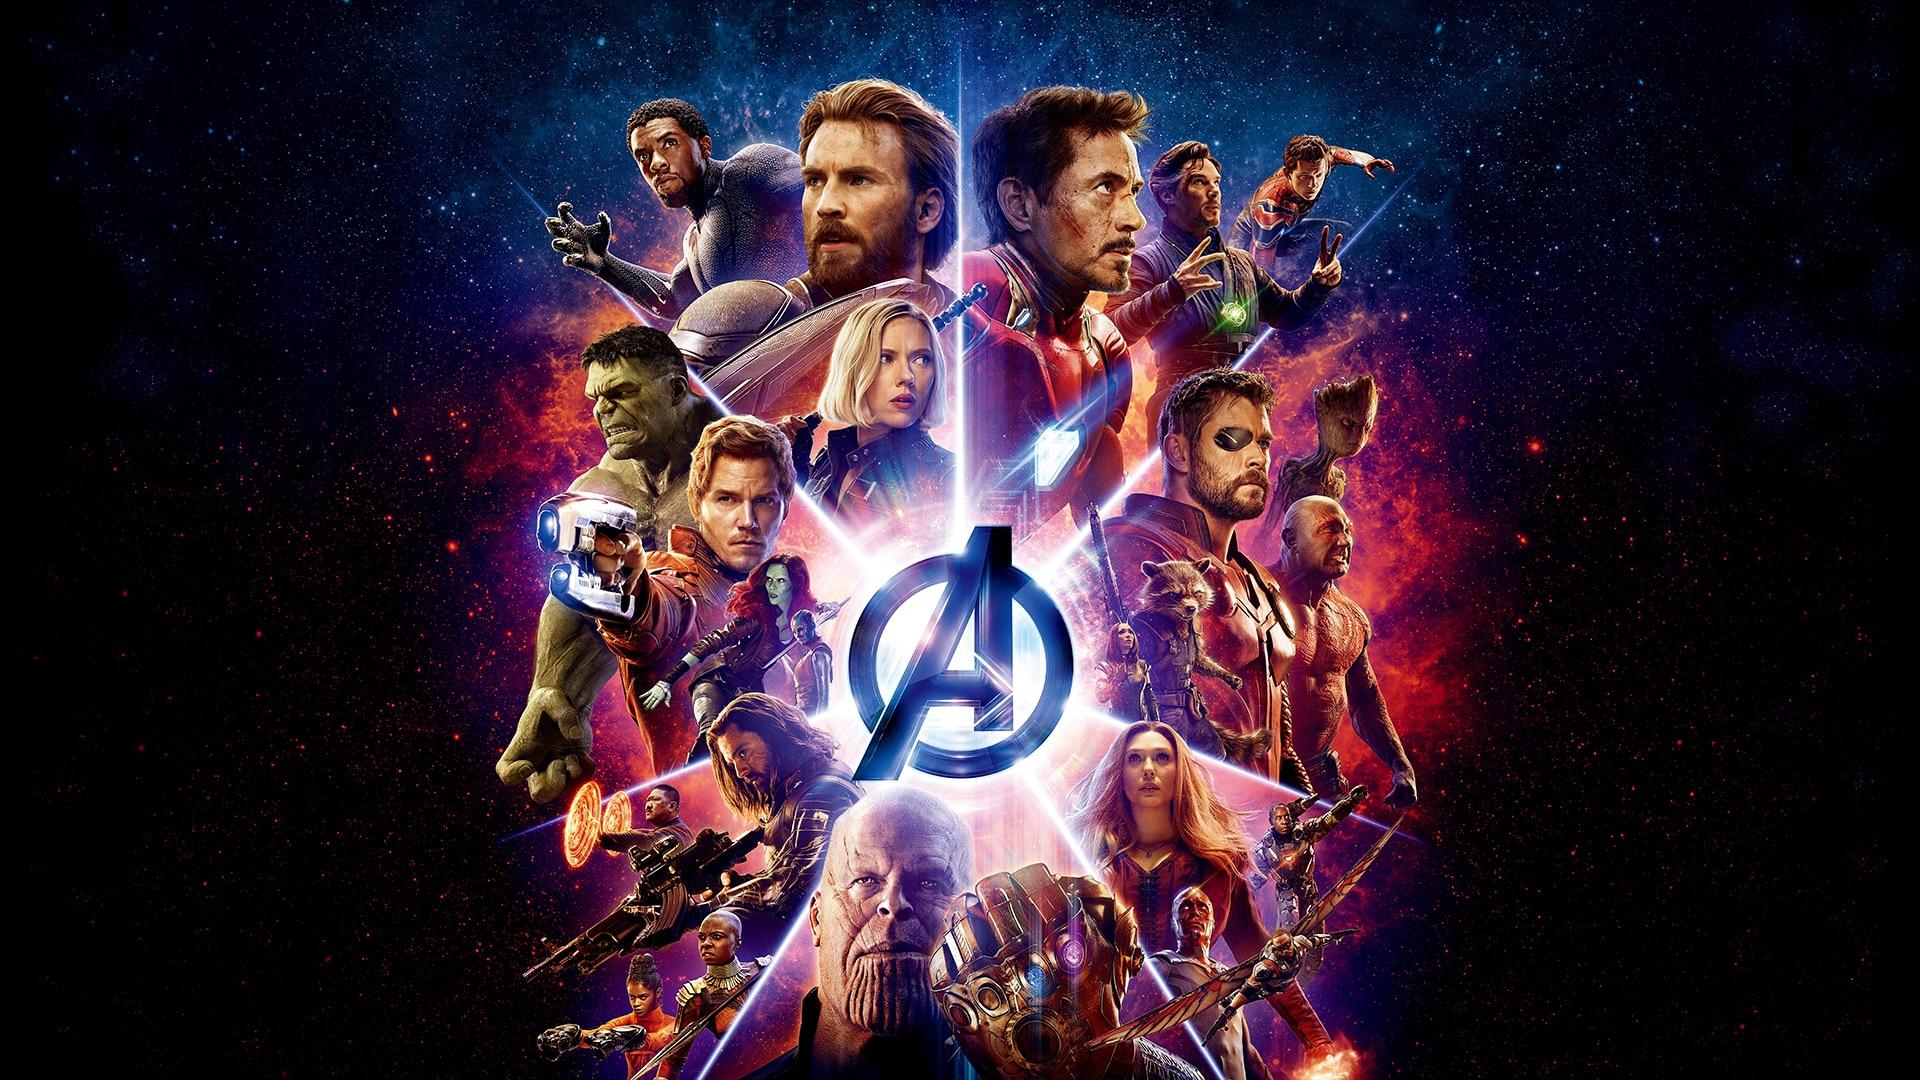 PRVÉ REAKCIE: Avengers: Infinity War Avengers: Infinity War bol prvýkrát ukázaný!